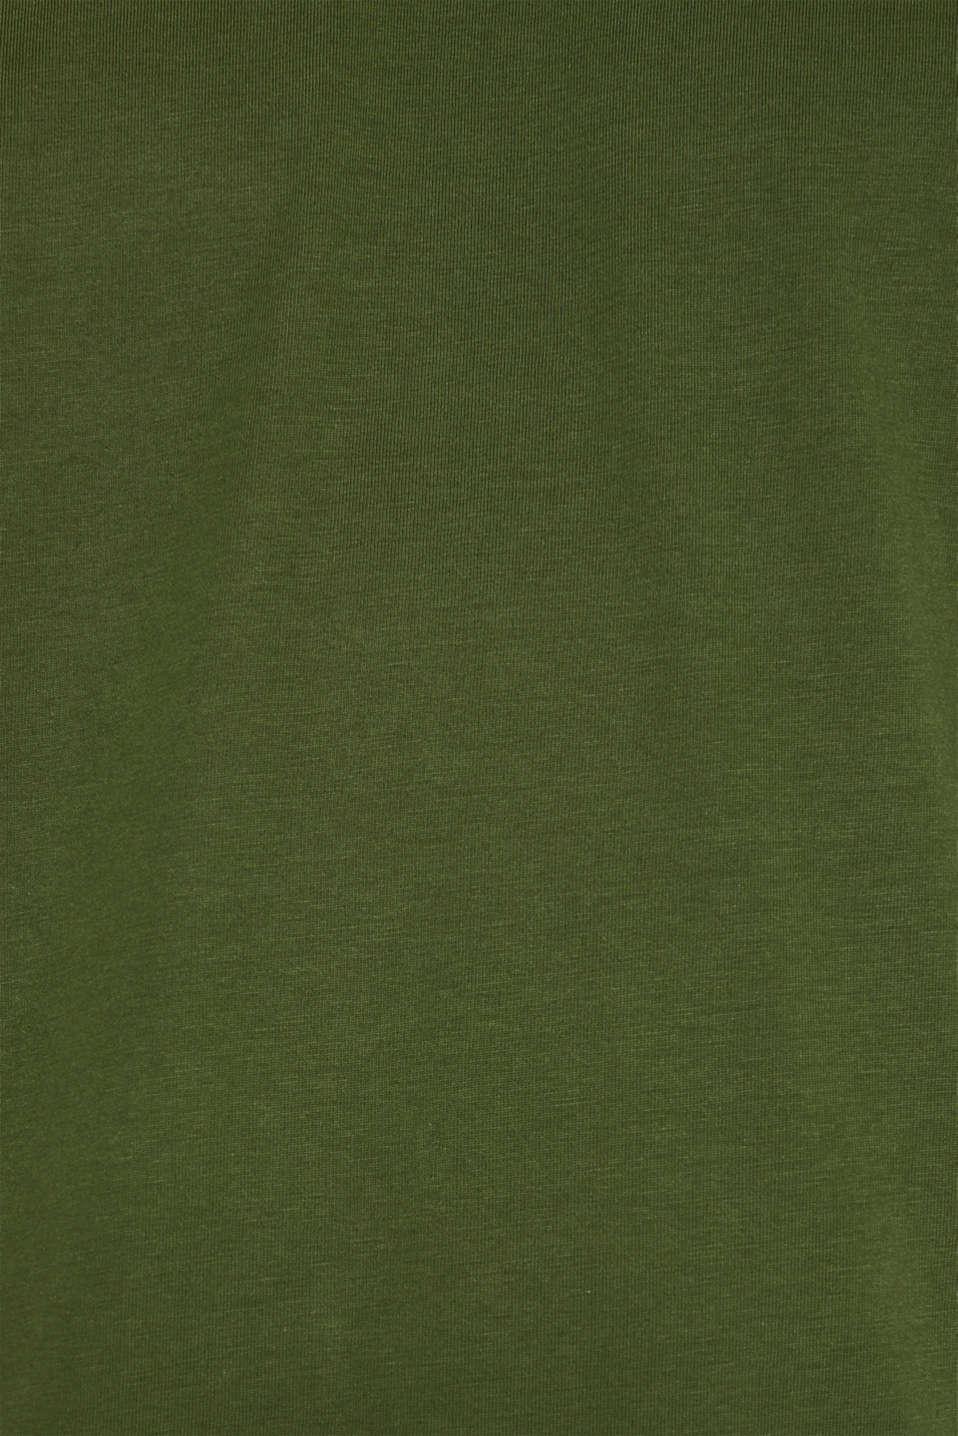 Jersey T-shirt in 100% cotton, KHAKI GREEN, detail image number 5